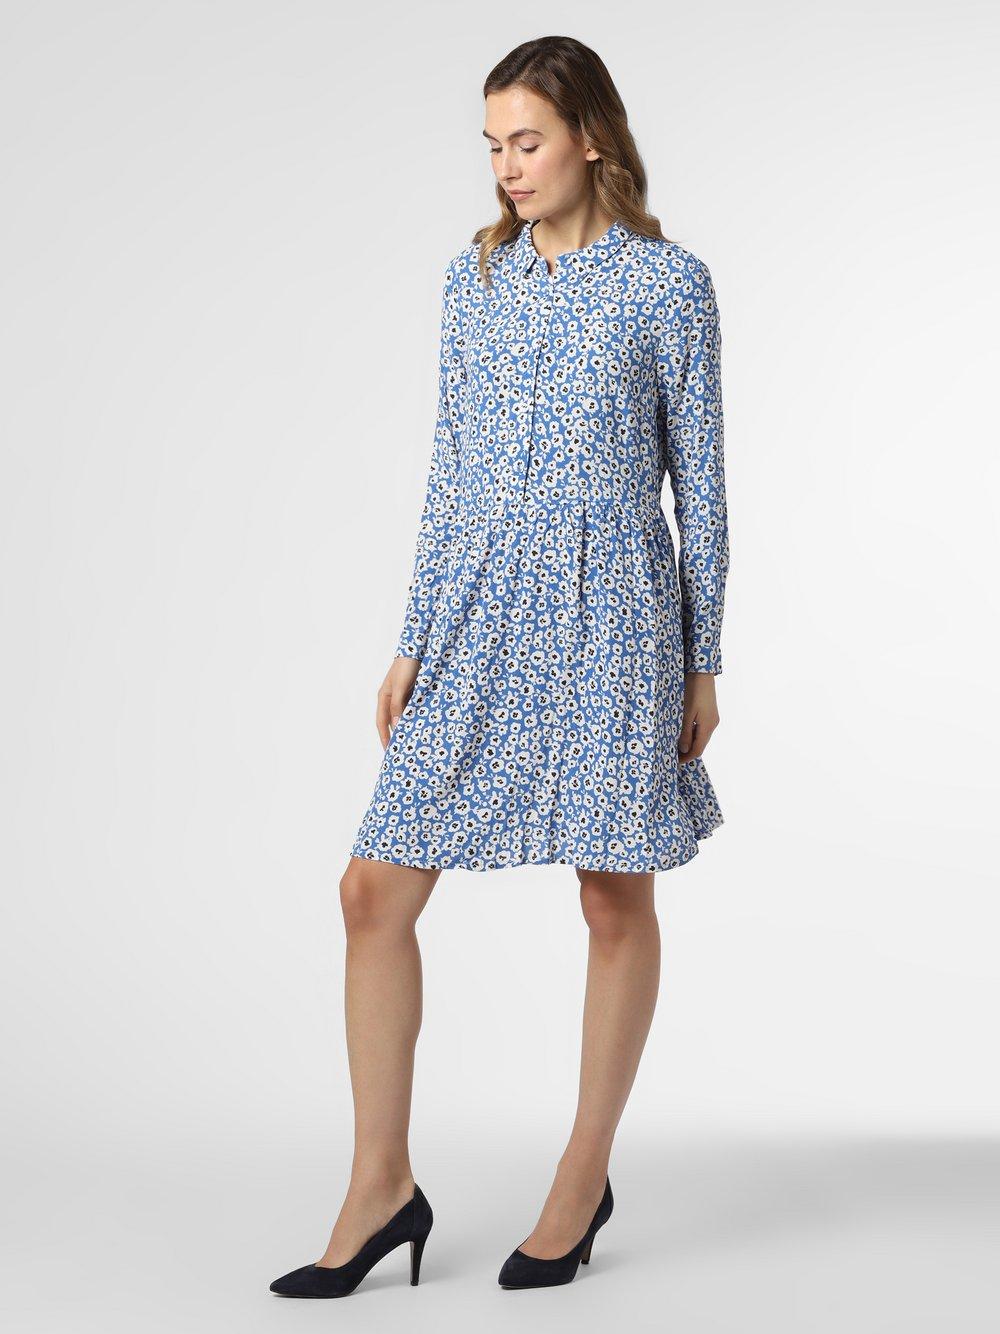 Minimum – Sukienka damska – Bindie, niebieski Van Graaf 464882-0001